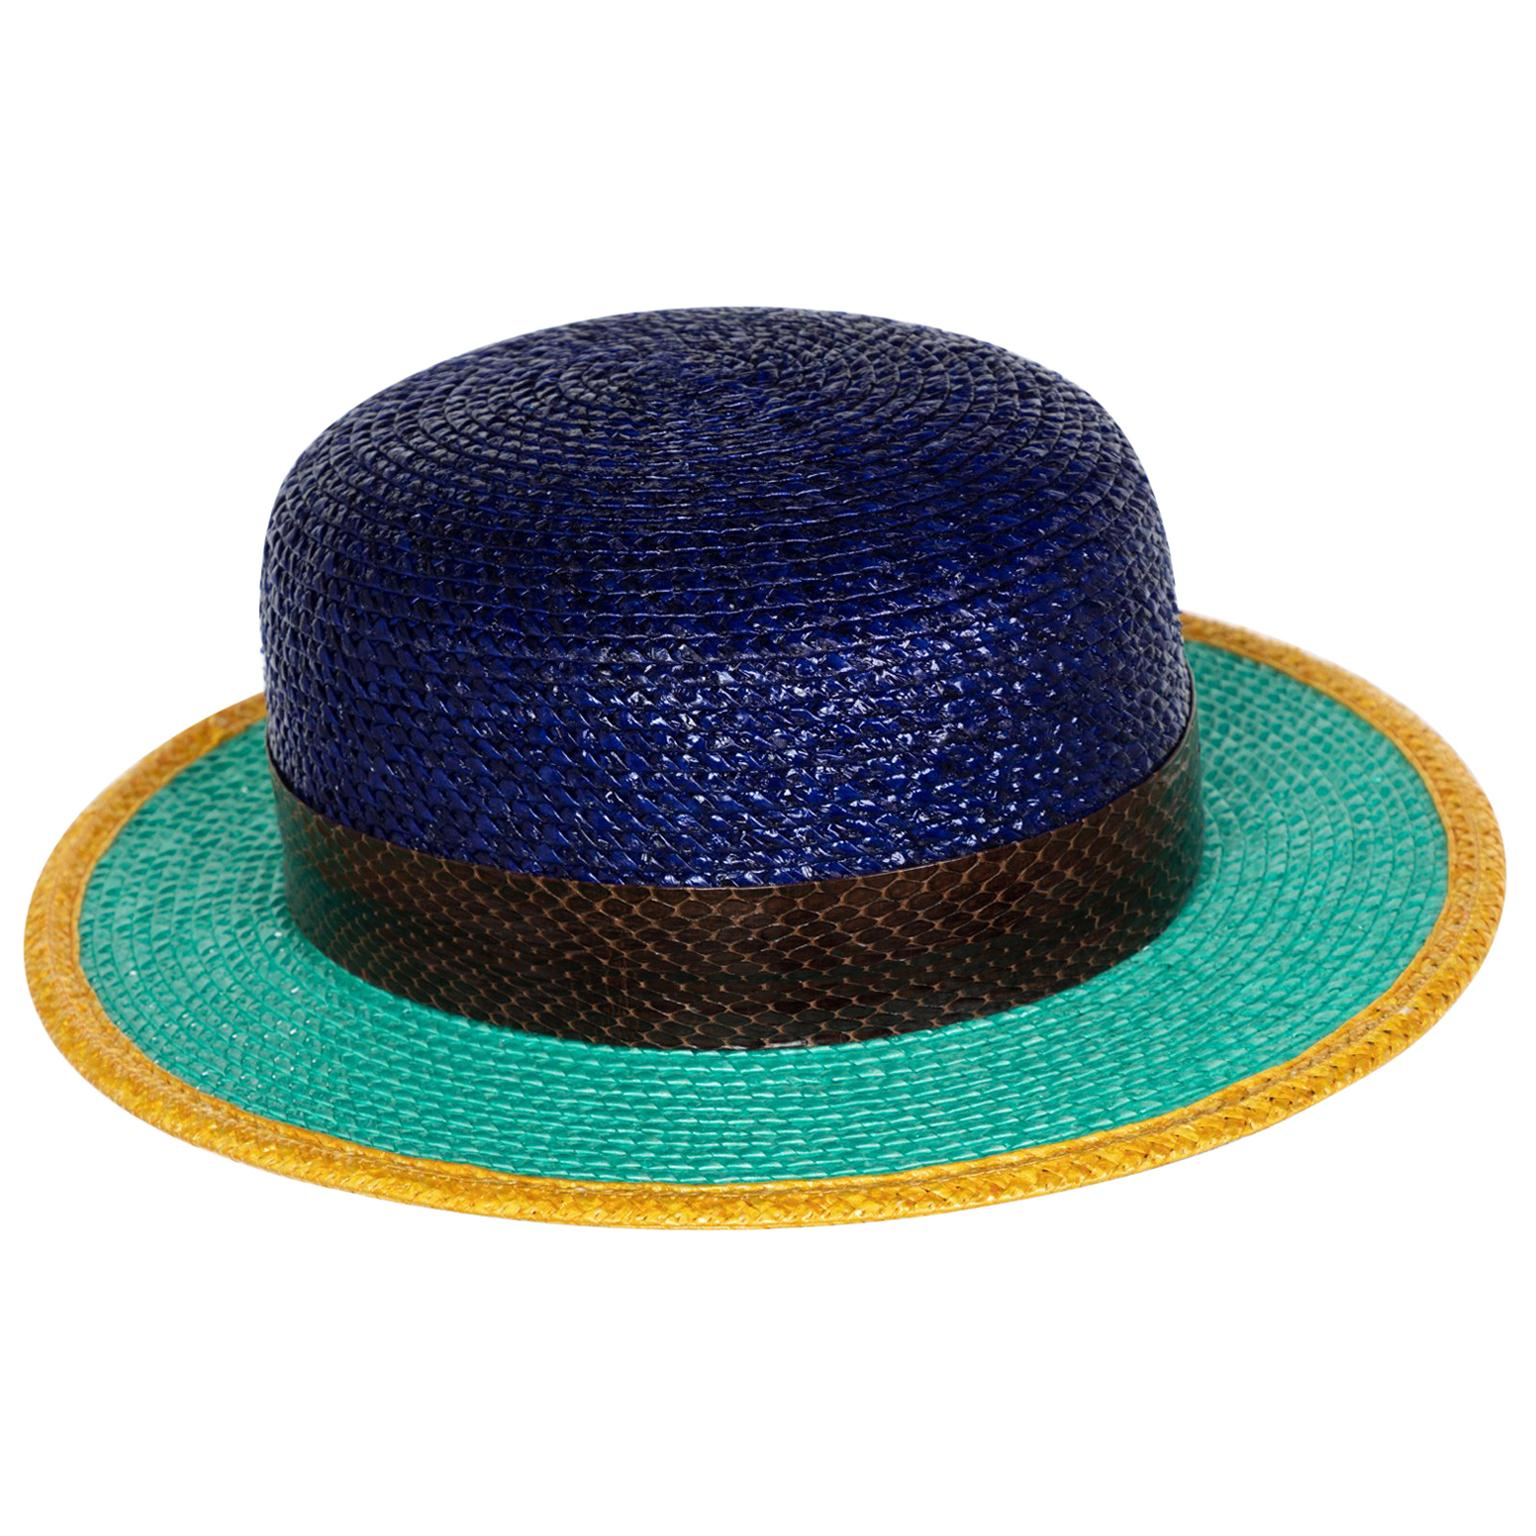 Yves Saint Laurent Glossy Color Block Snakeskin Trim Bowler Hat YSL, 1990s